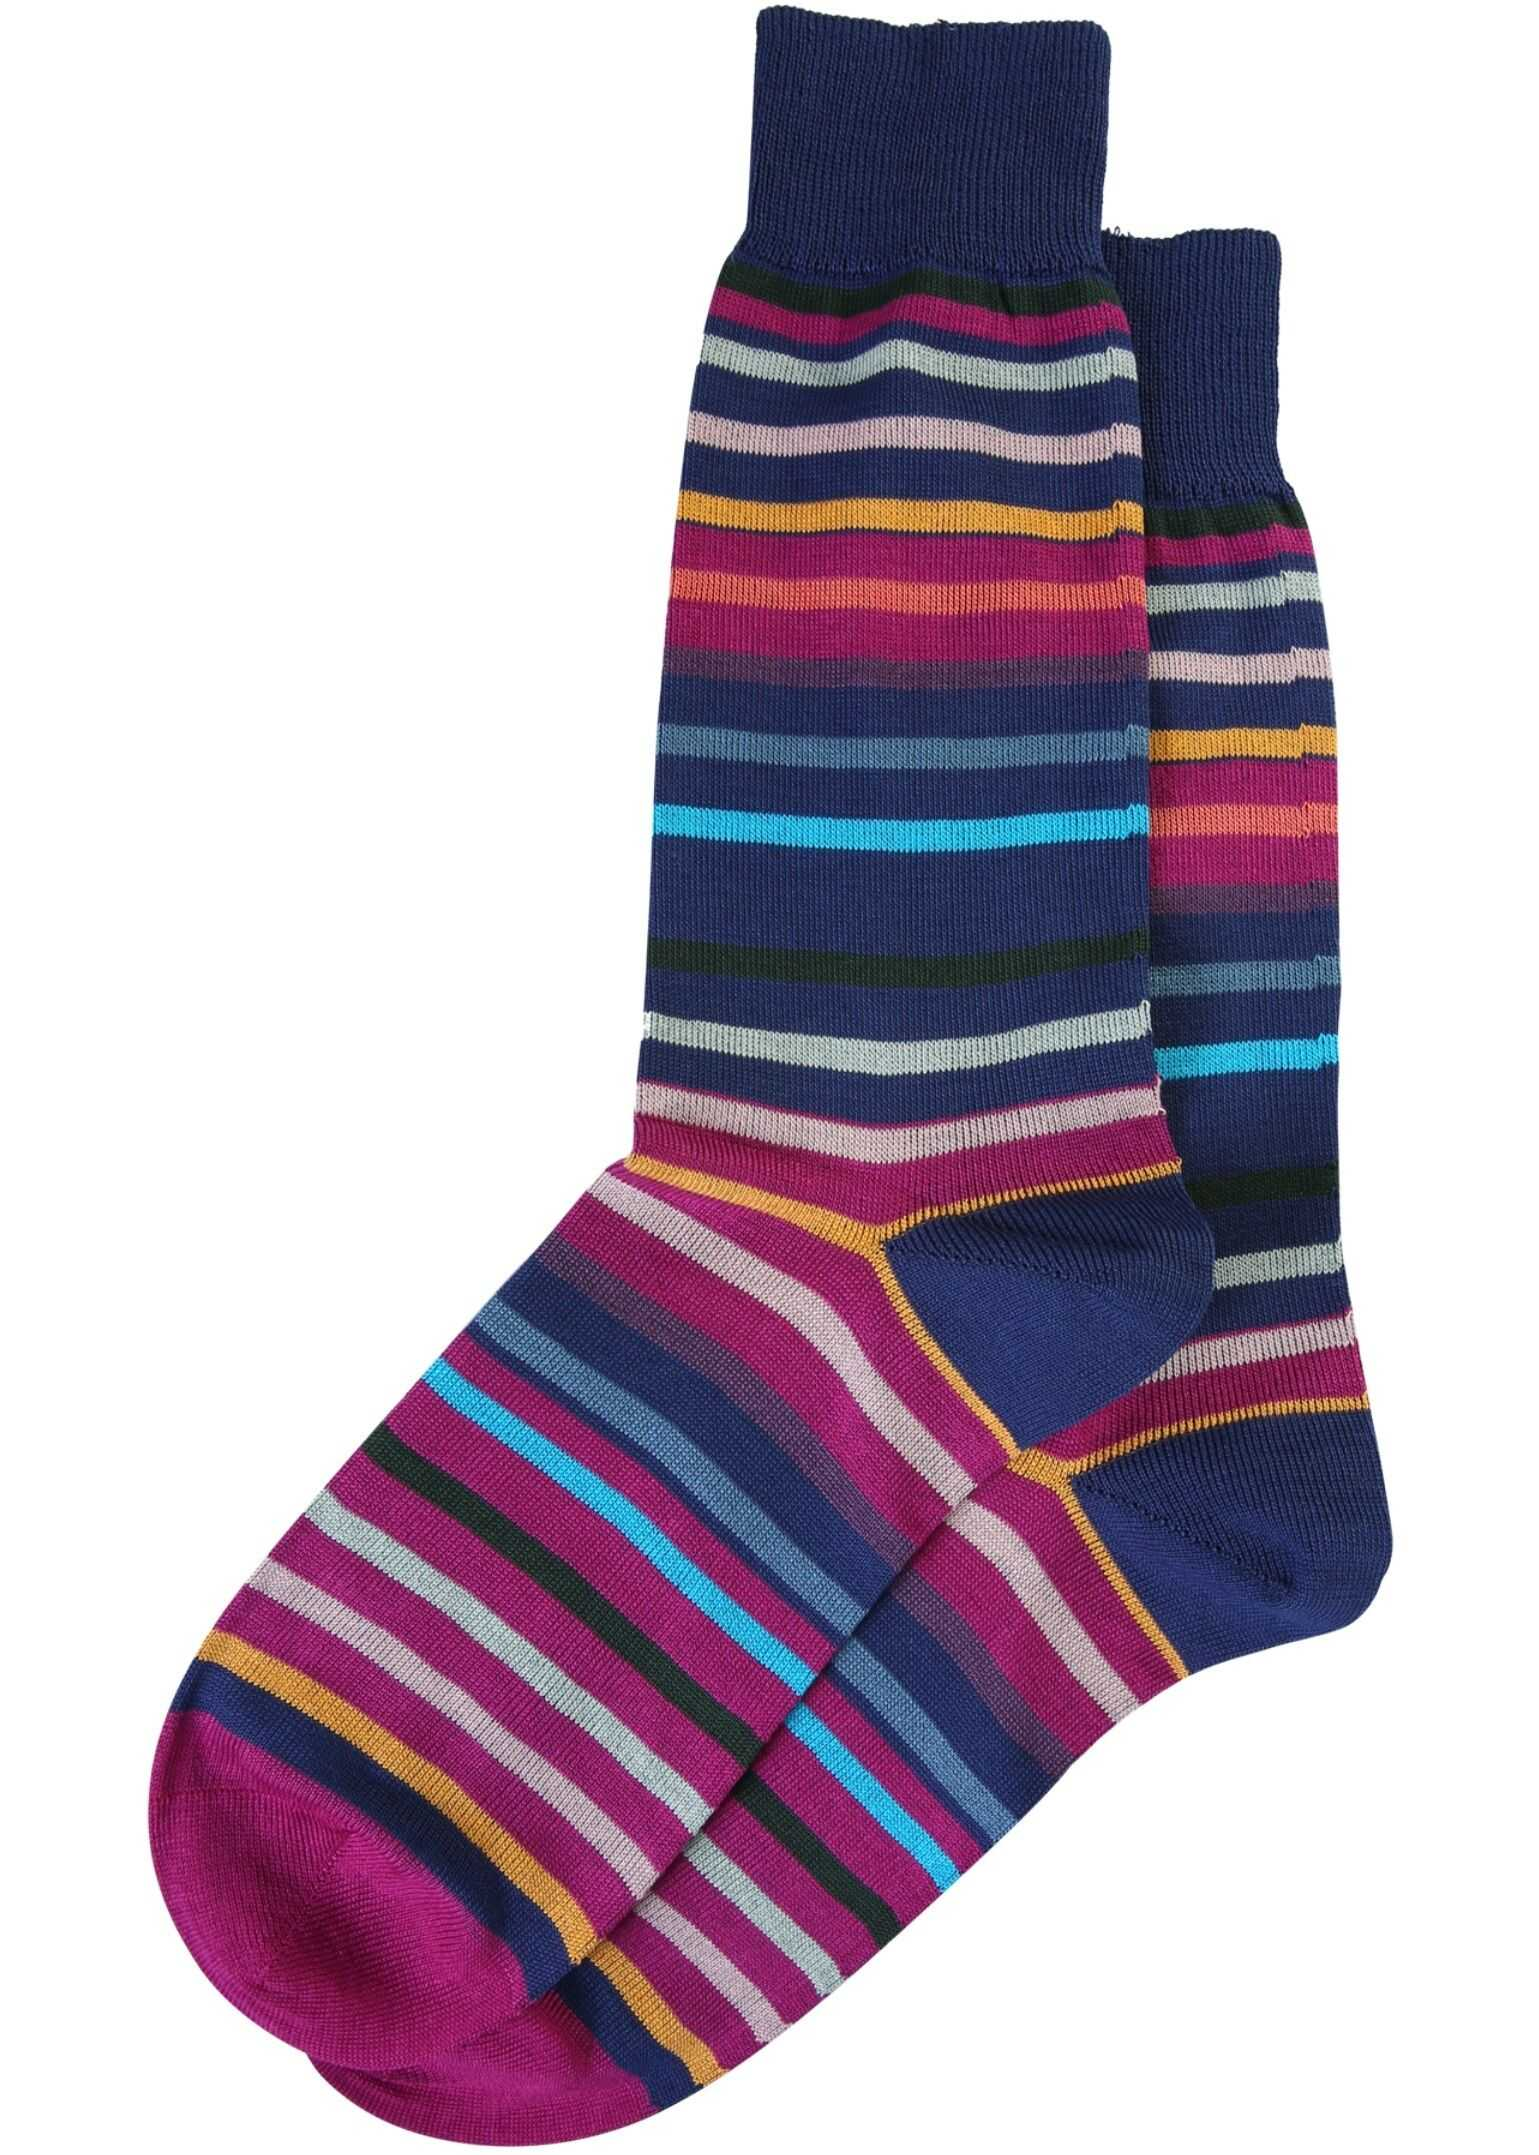 Paul Smith Striped Socks BLUE imagine